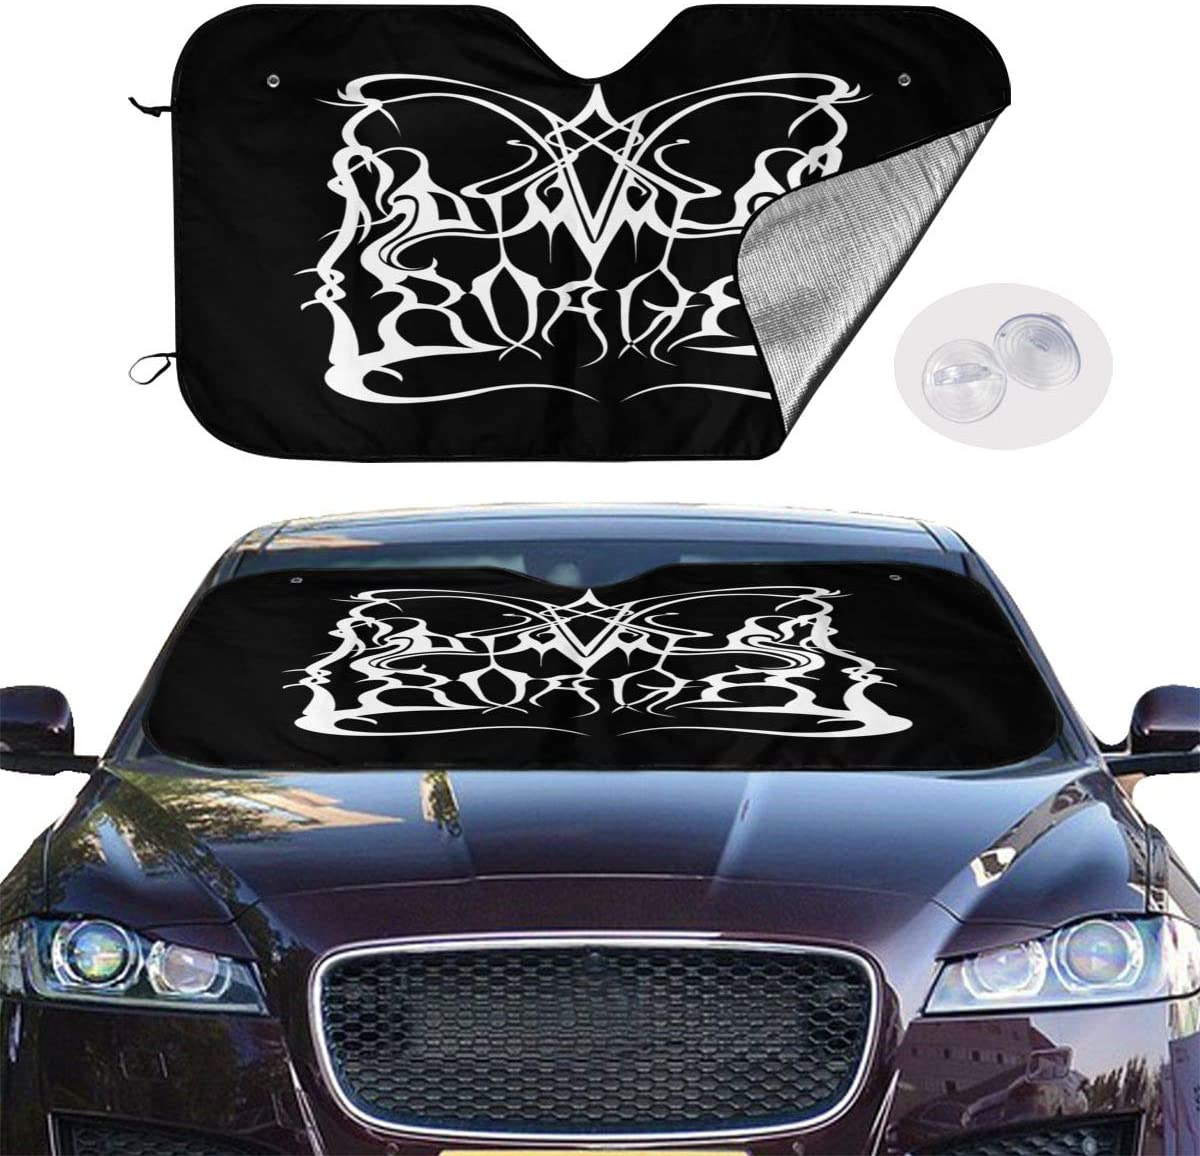 NOT Dimmu Borgir Universal and Stylish Car Windshield Visor